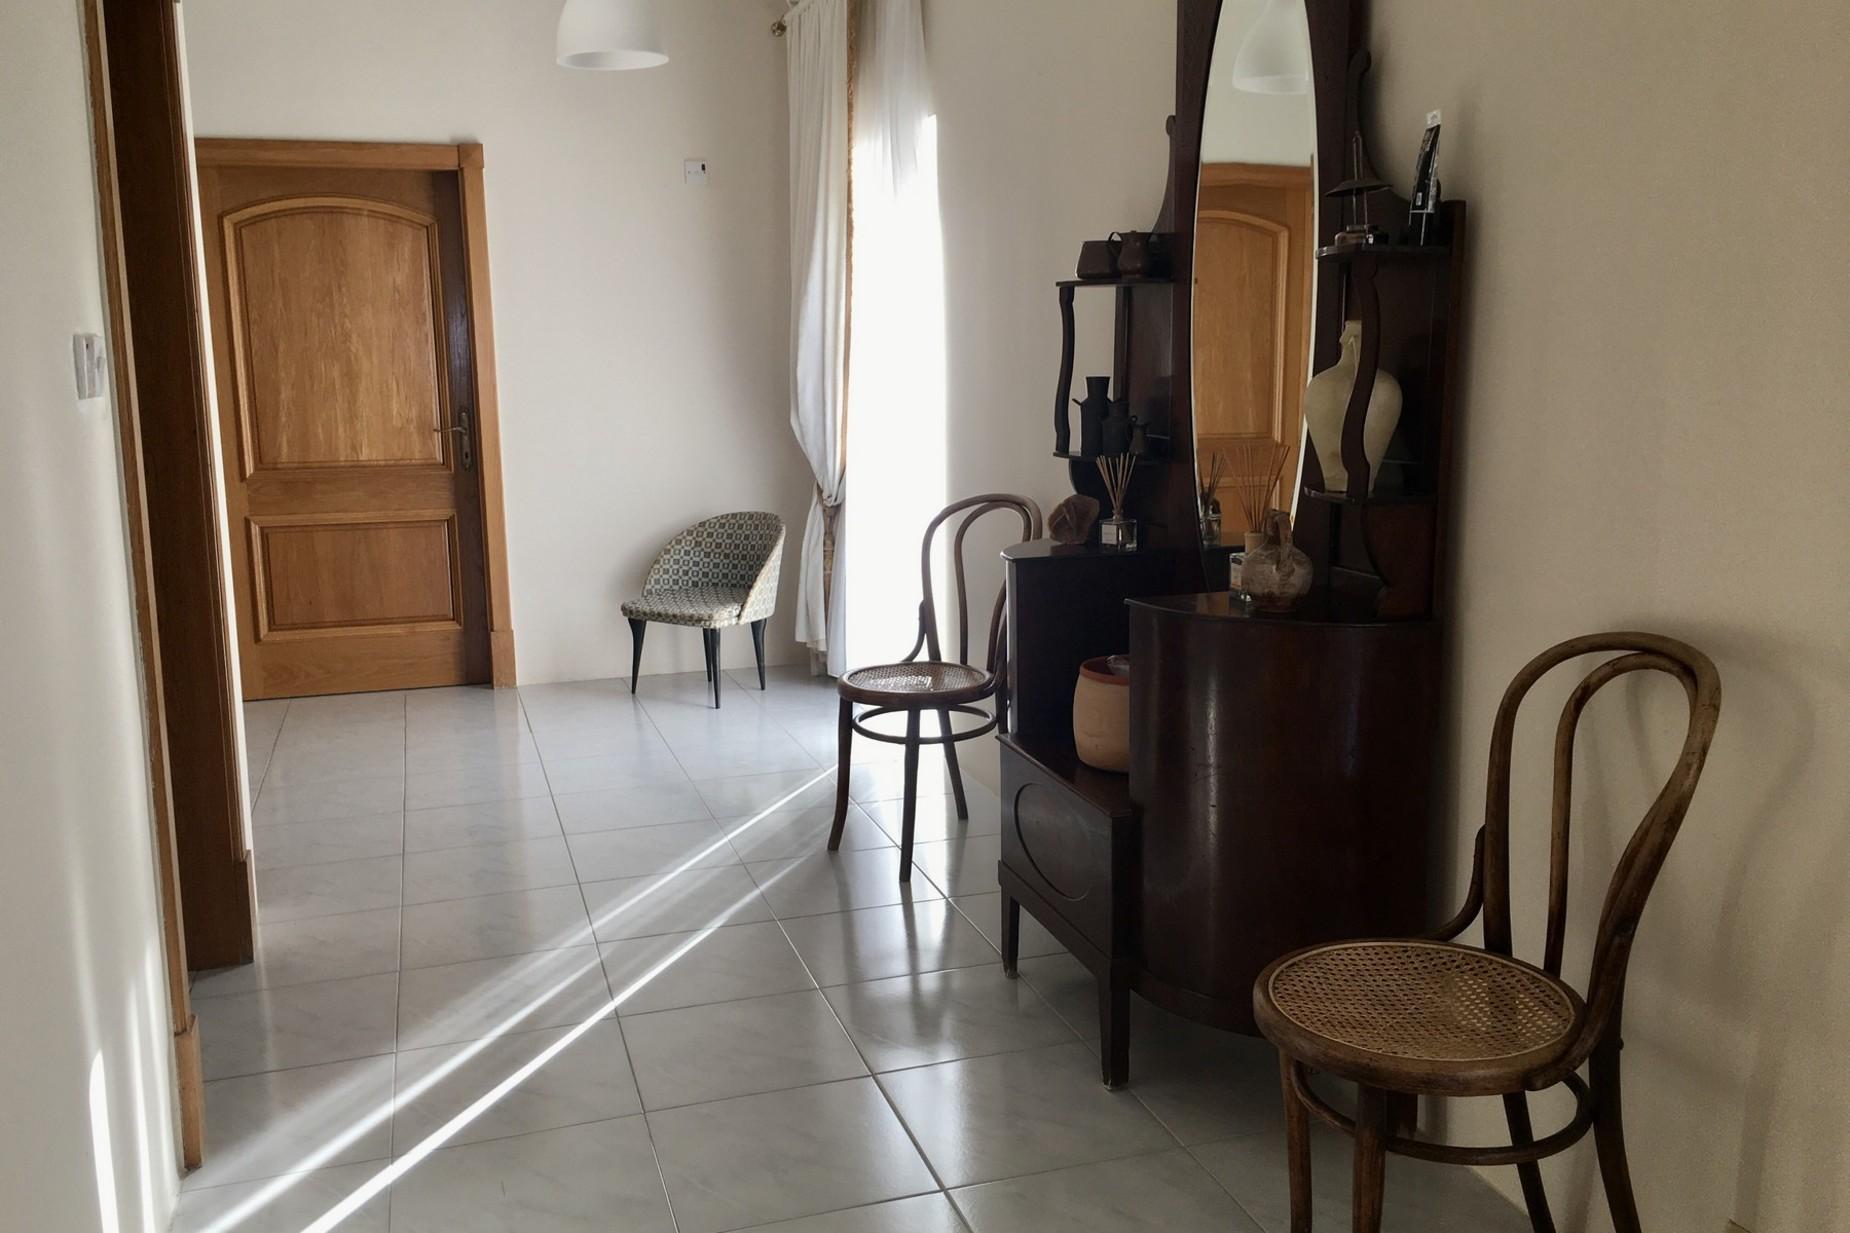 3 bed Villa For Sale in Pembroke, Pembroke - thumb 7